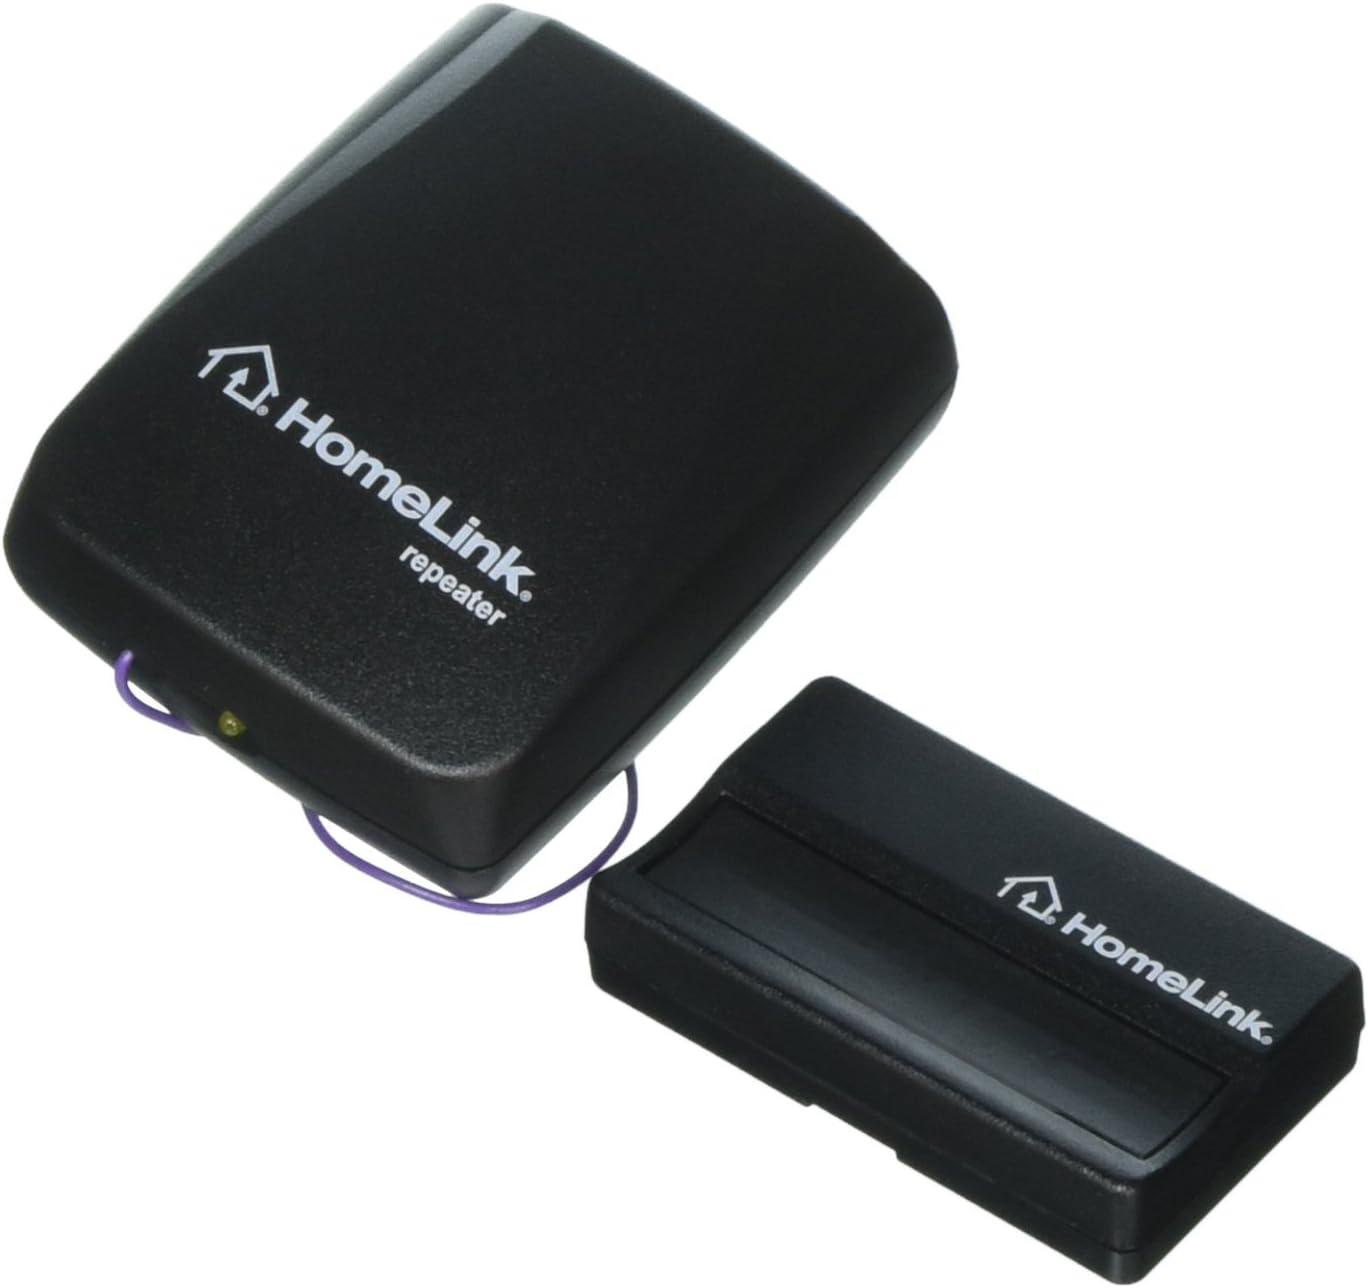 Liftmaster 855lm Chamberlain OEM Homelink Compatibility Bridge